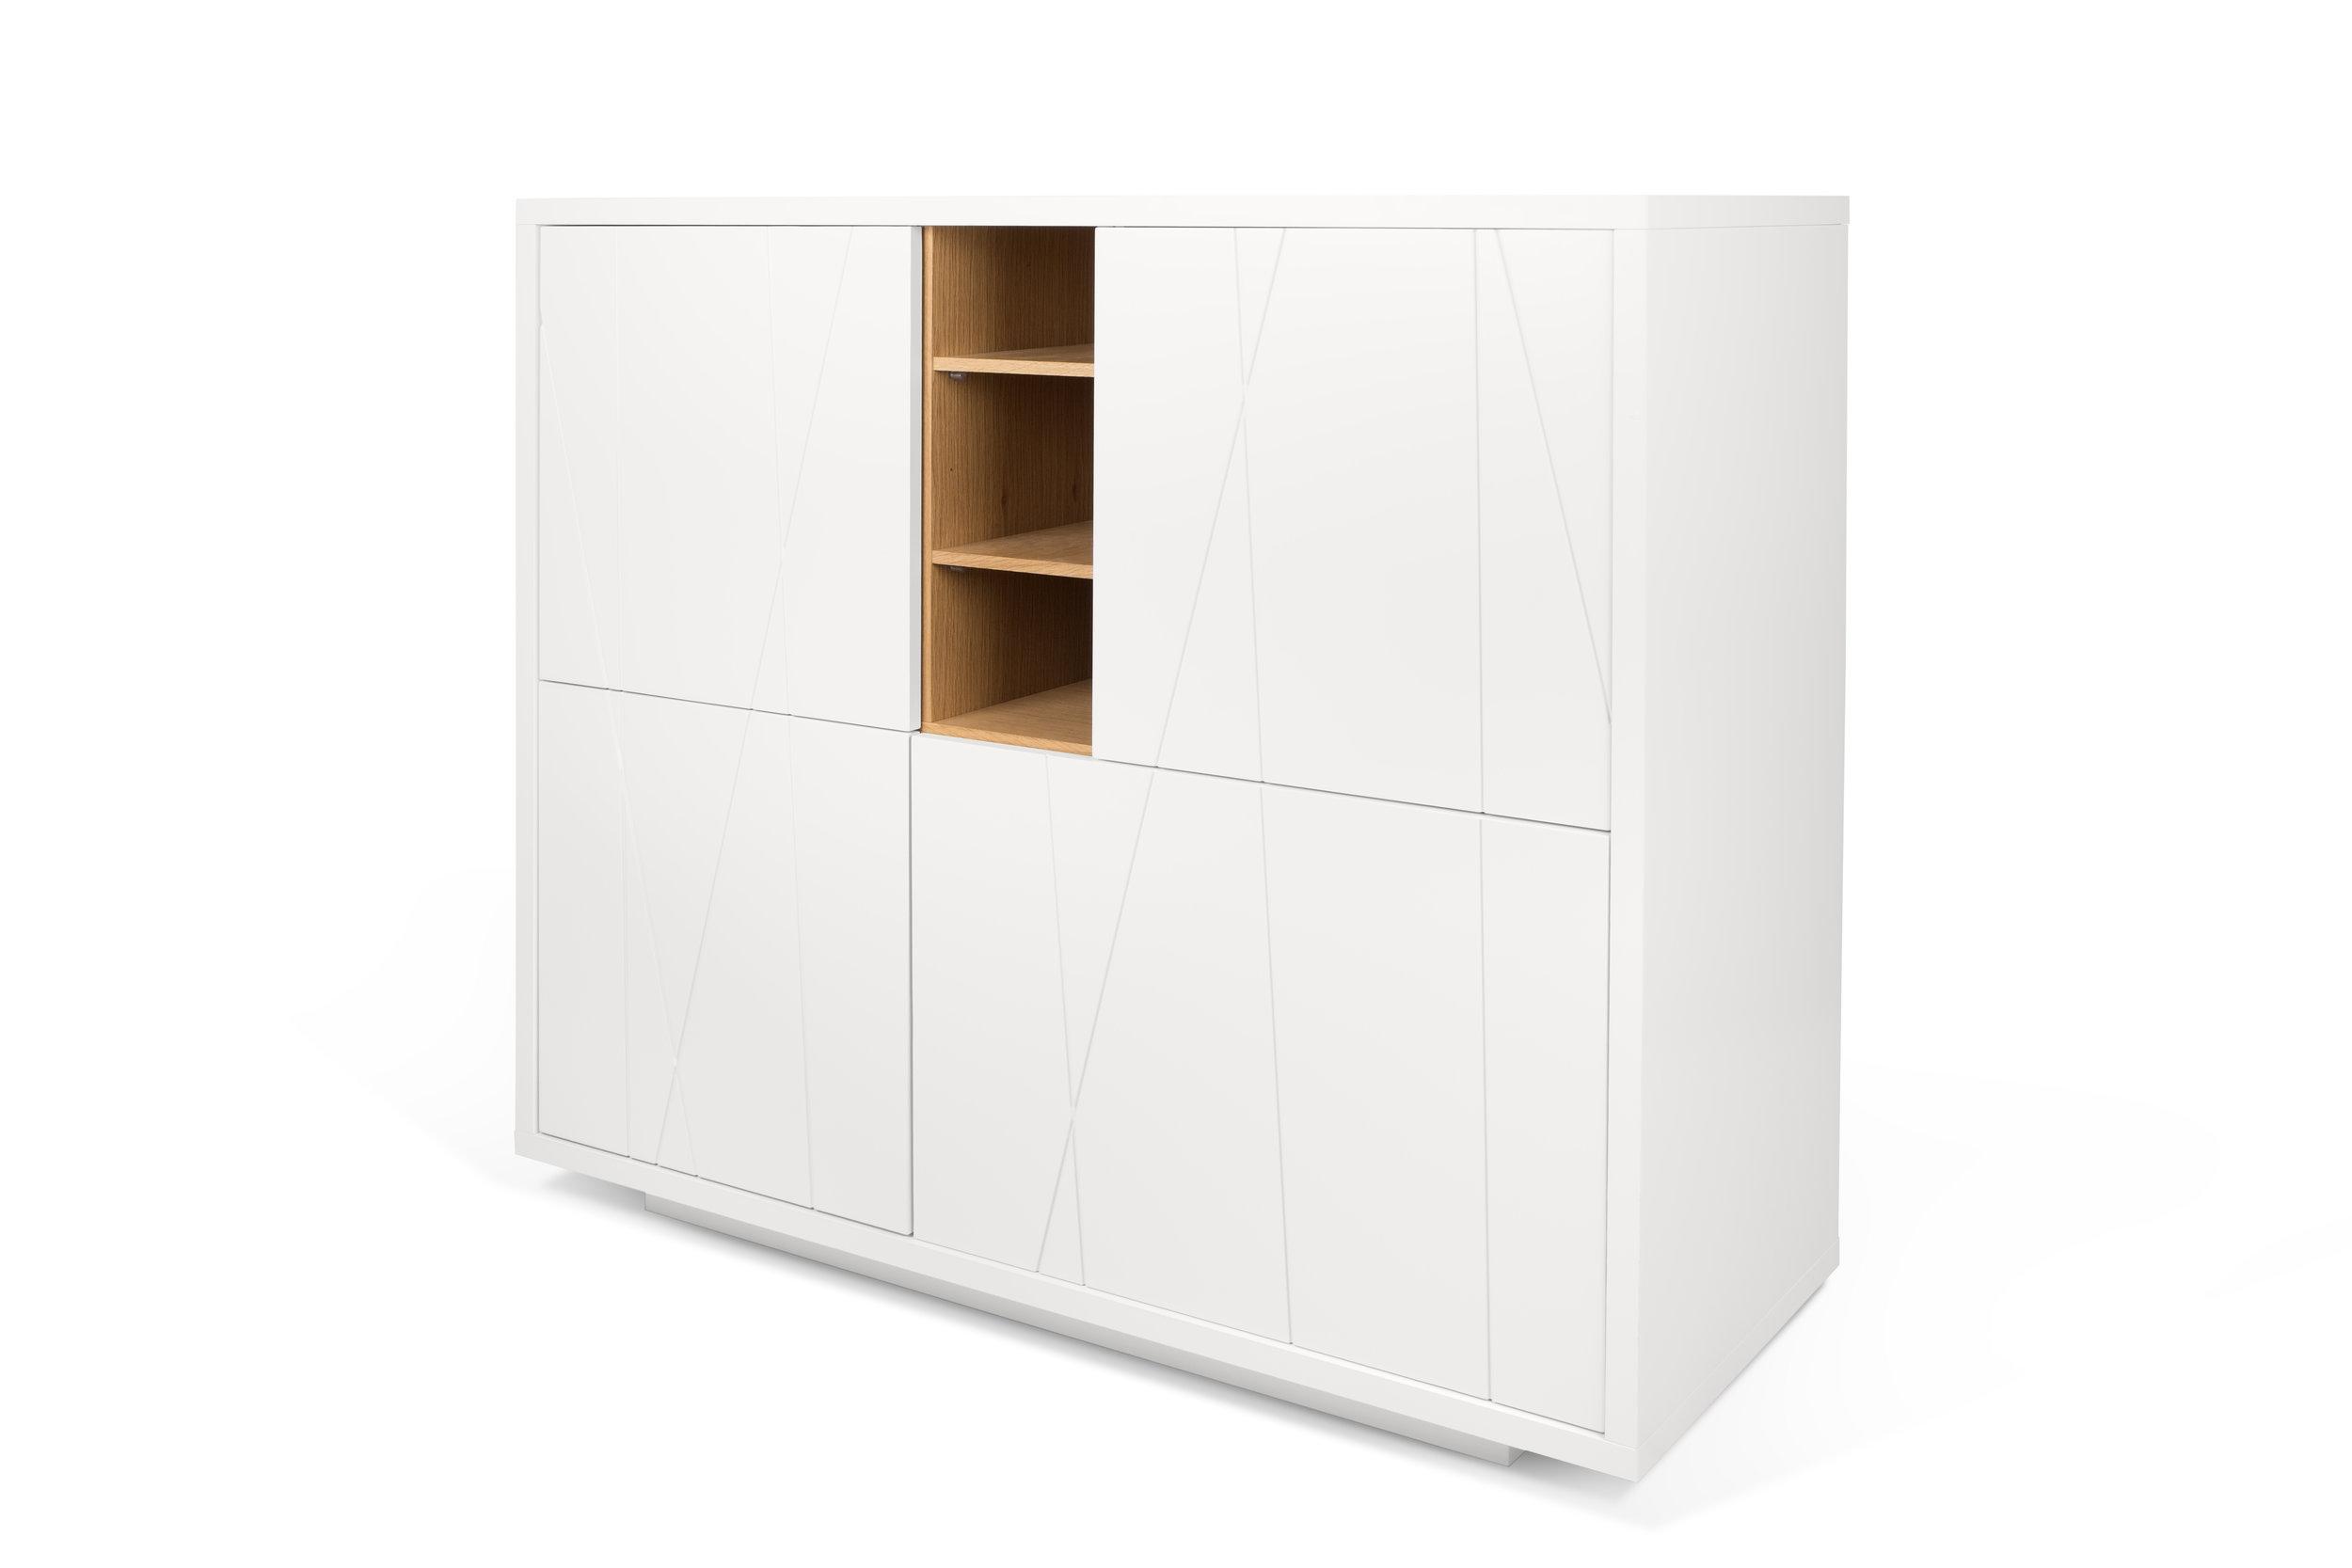 niche_cupboard.jpg